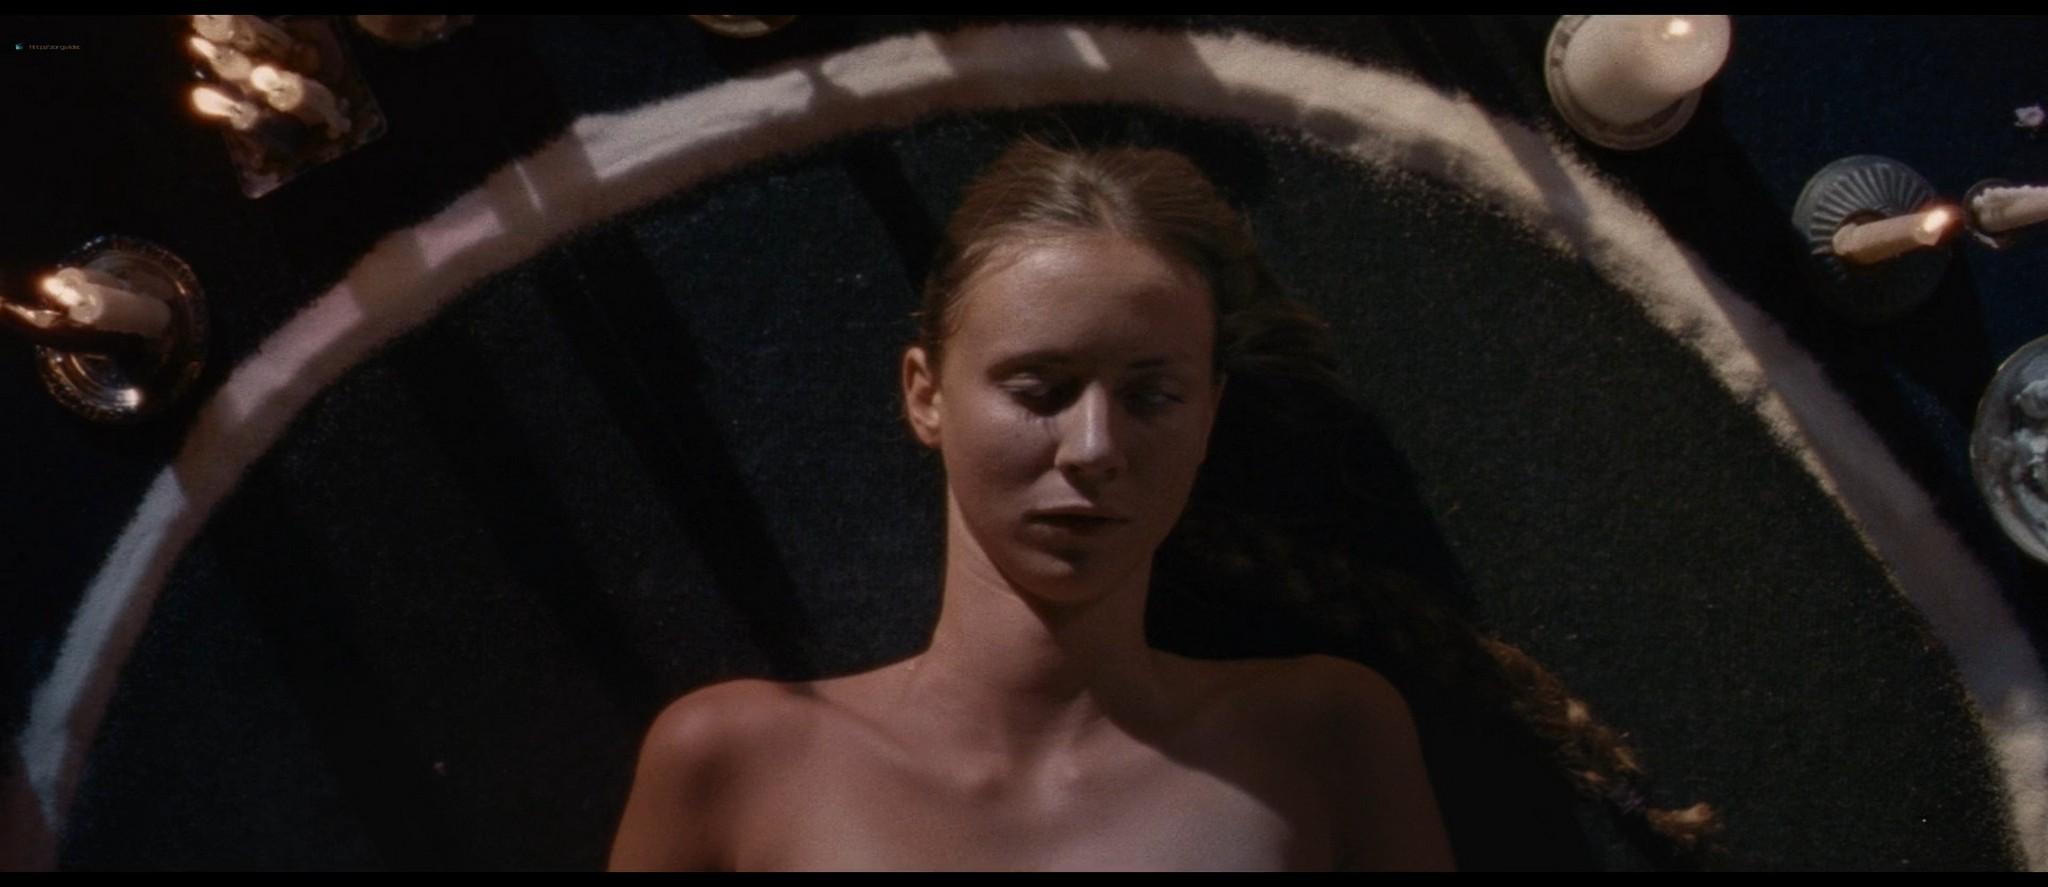 Lilli Lorenz nude full frontal - Luz (2018) HD 1080p BluRay (10)